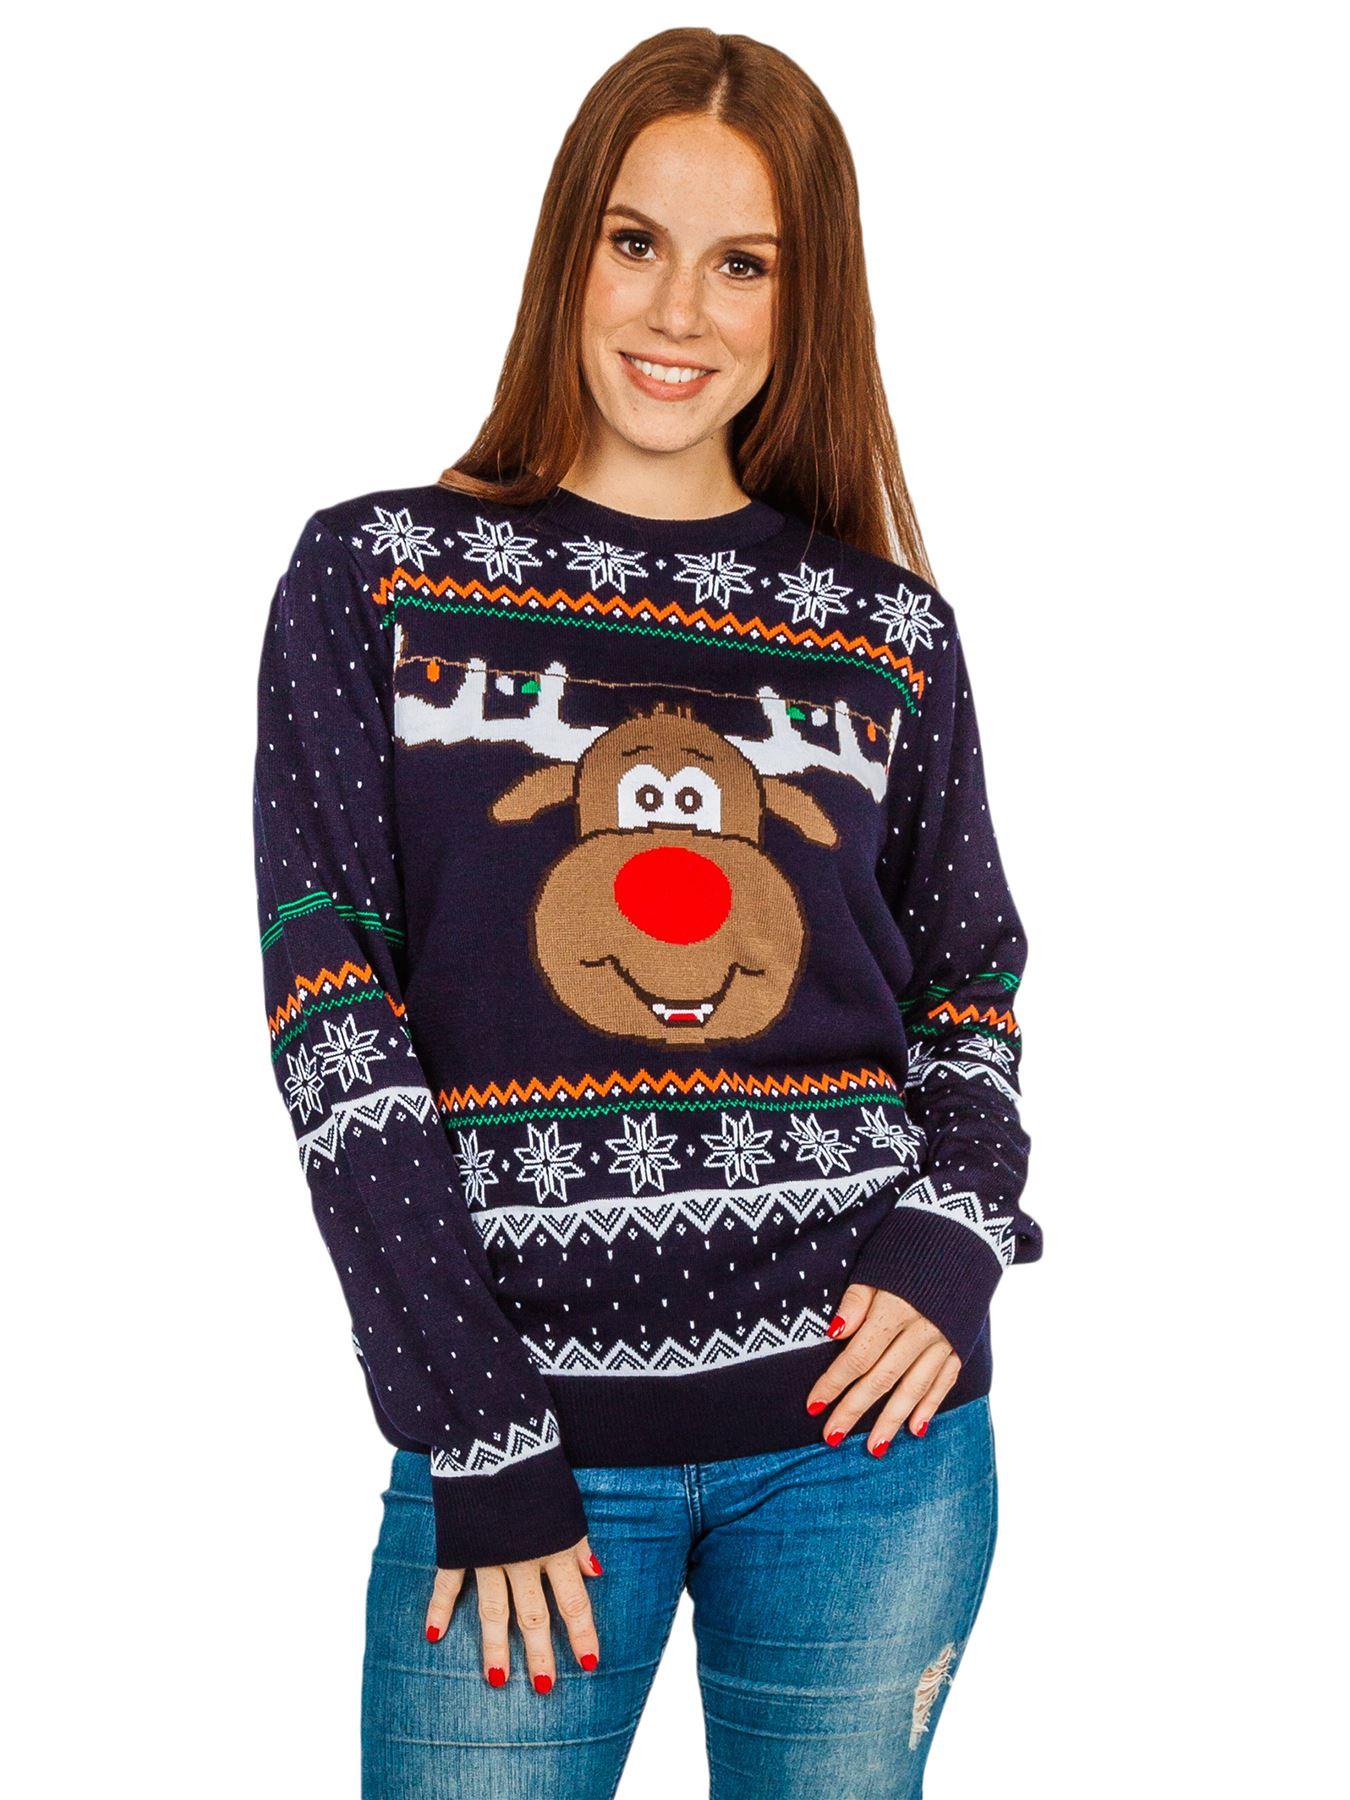 Unisex-Christmas-Jumper-Girls-Boys-Reindeer-Snow-Flake-Knitted-Pullover-Sweater thumbnail 2